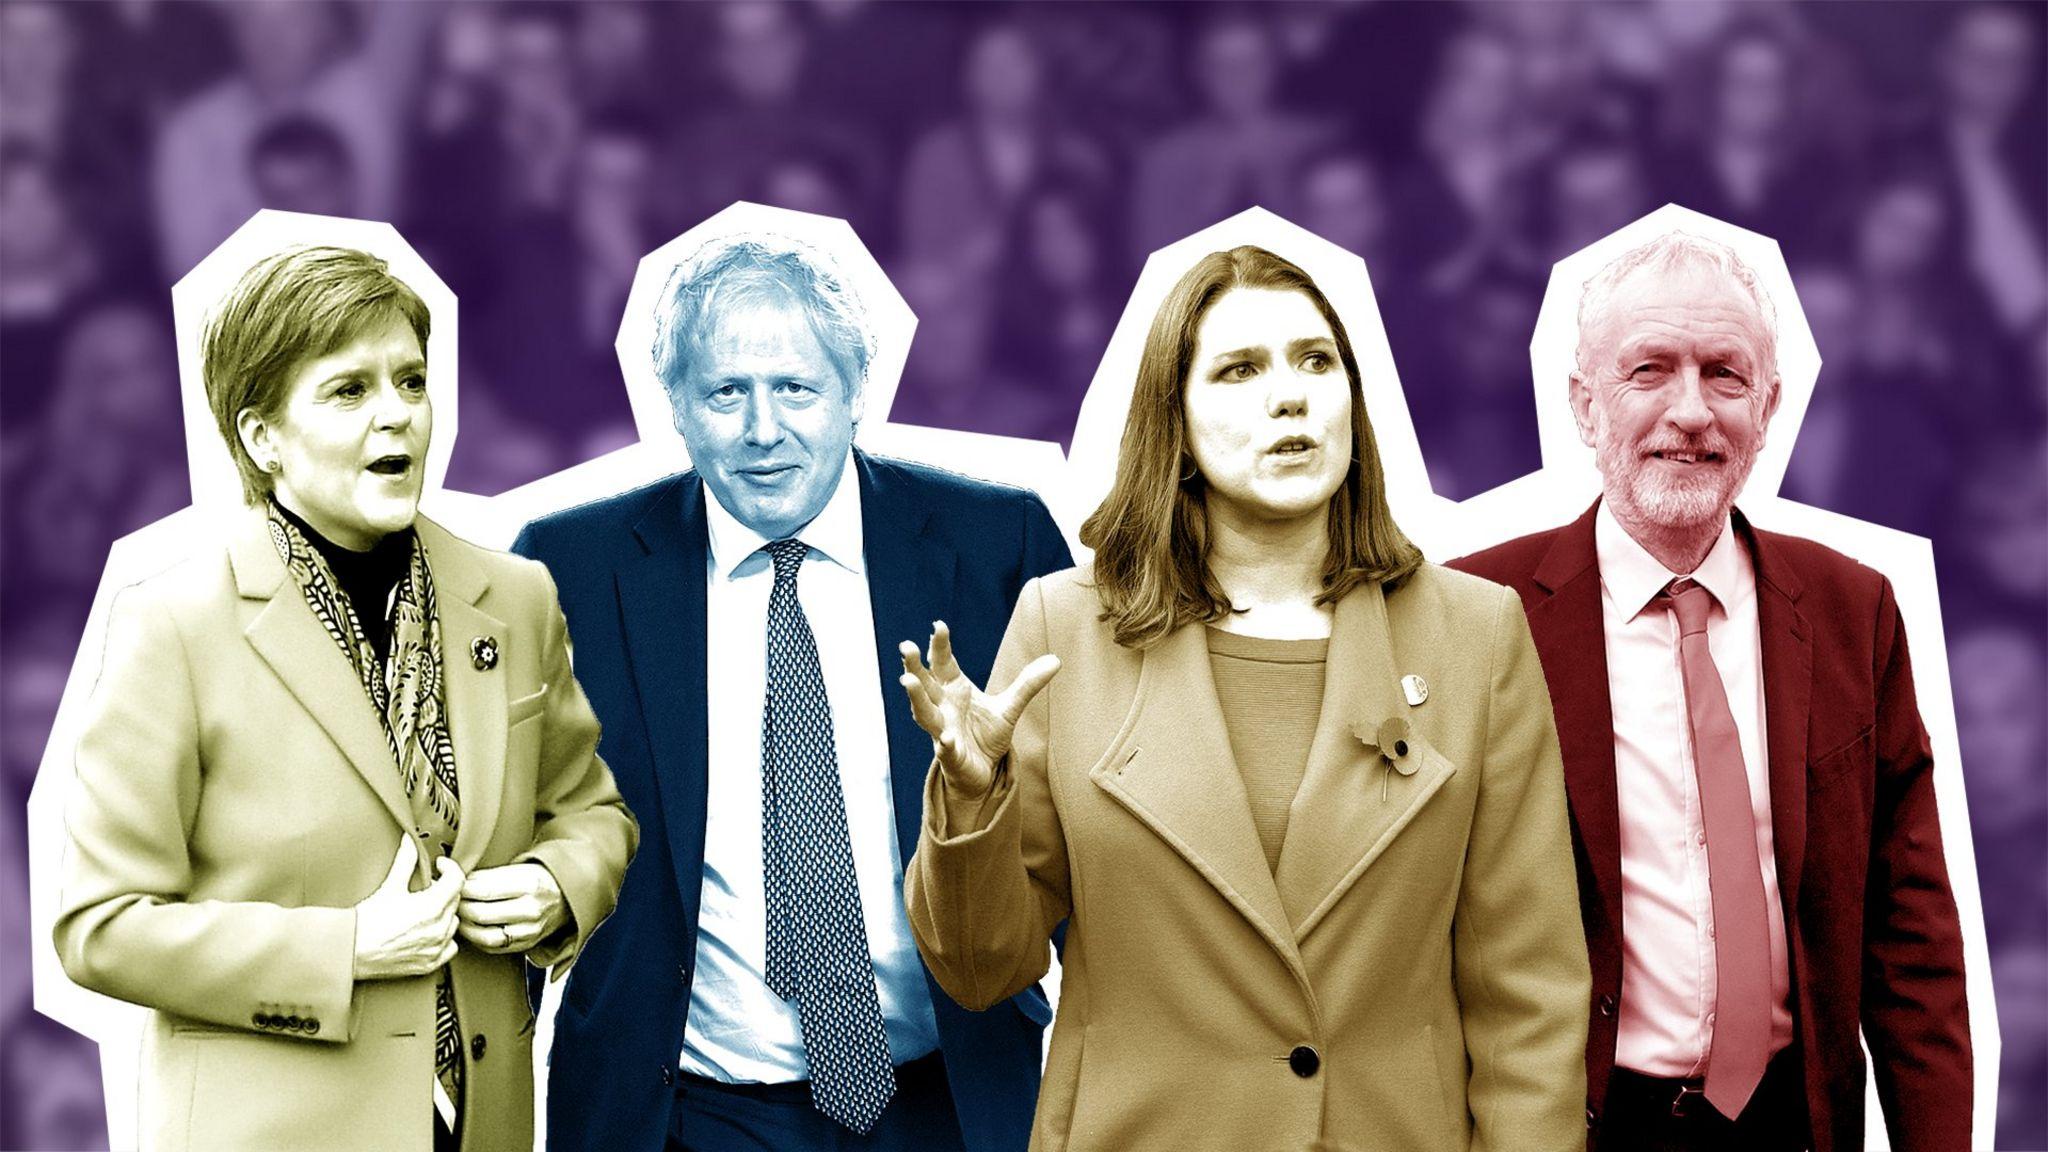 Party leaders Nicola Swinson, Boris Johnson, Jo Swinson and Jeremy Corbyn